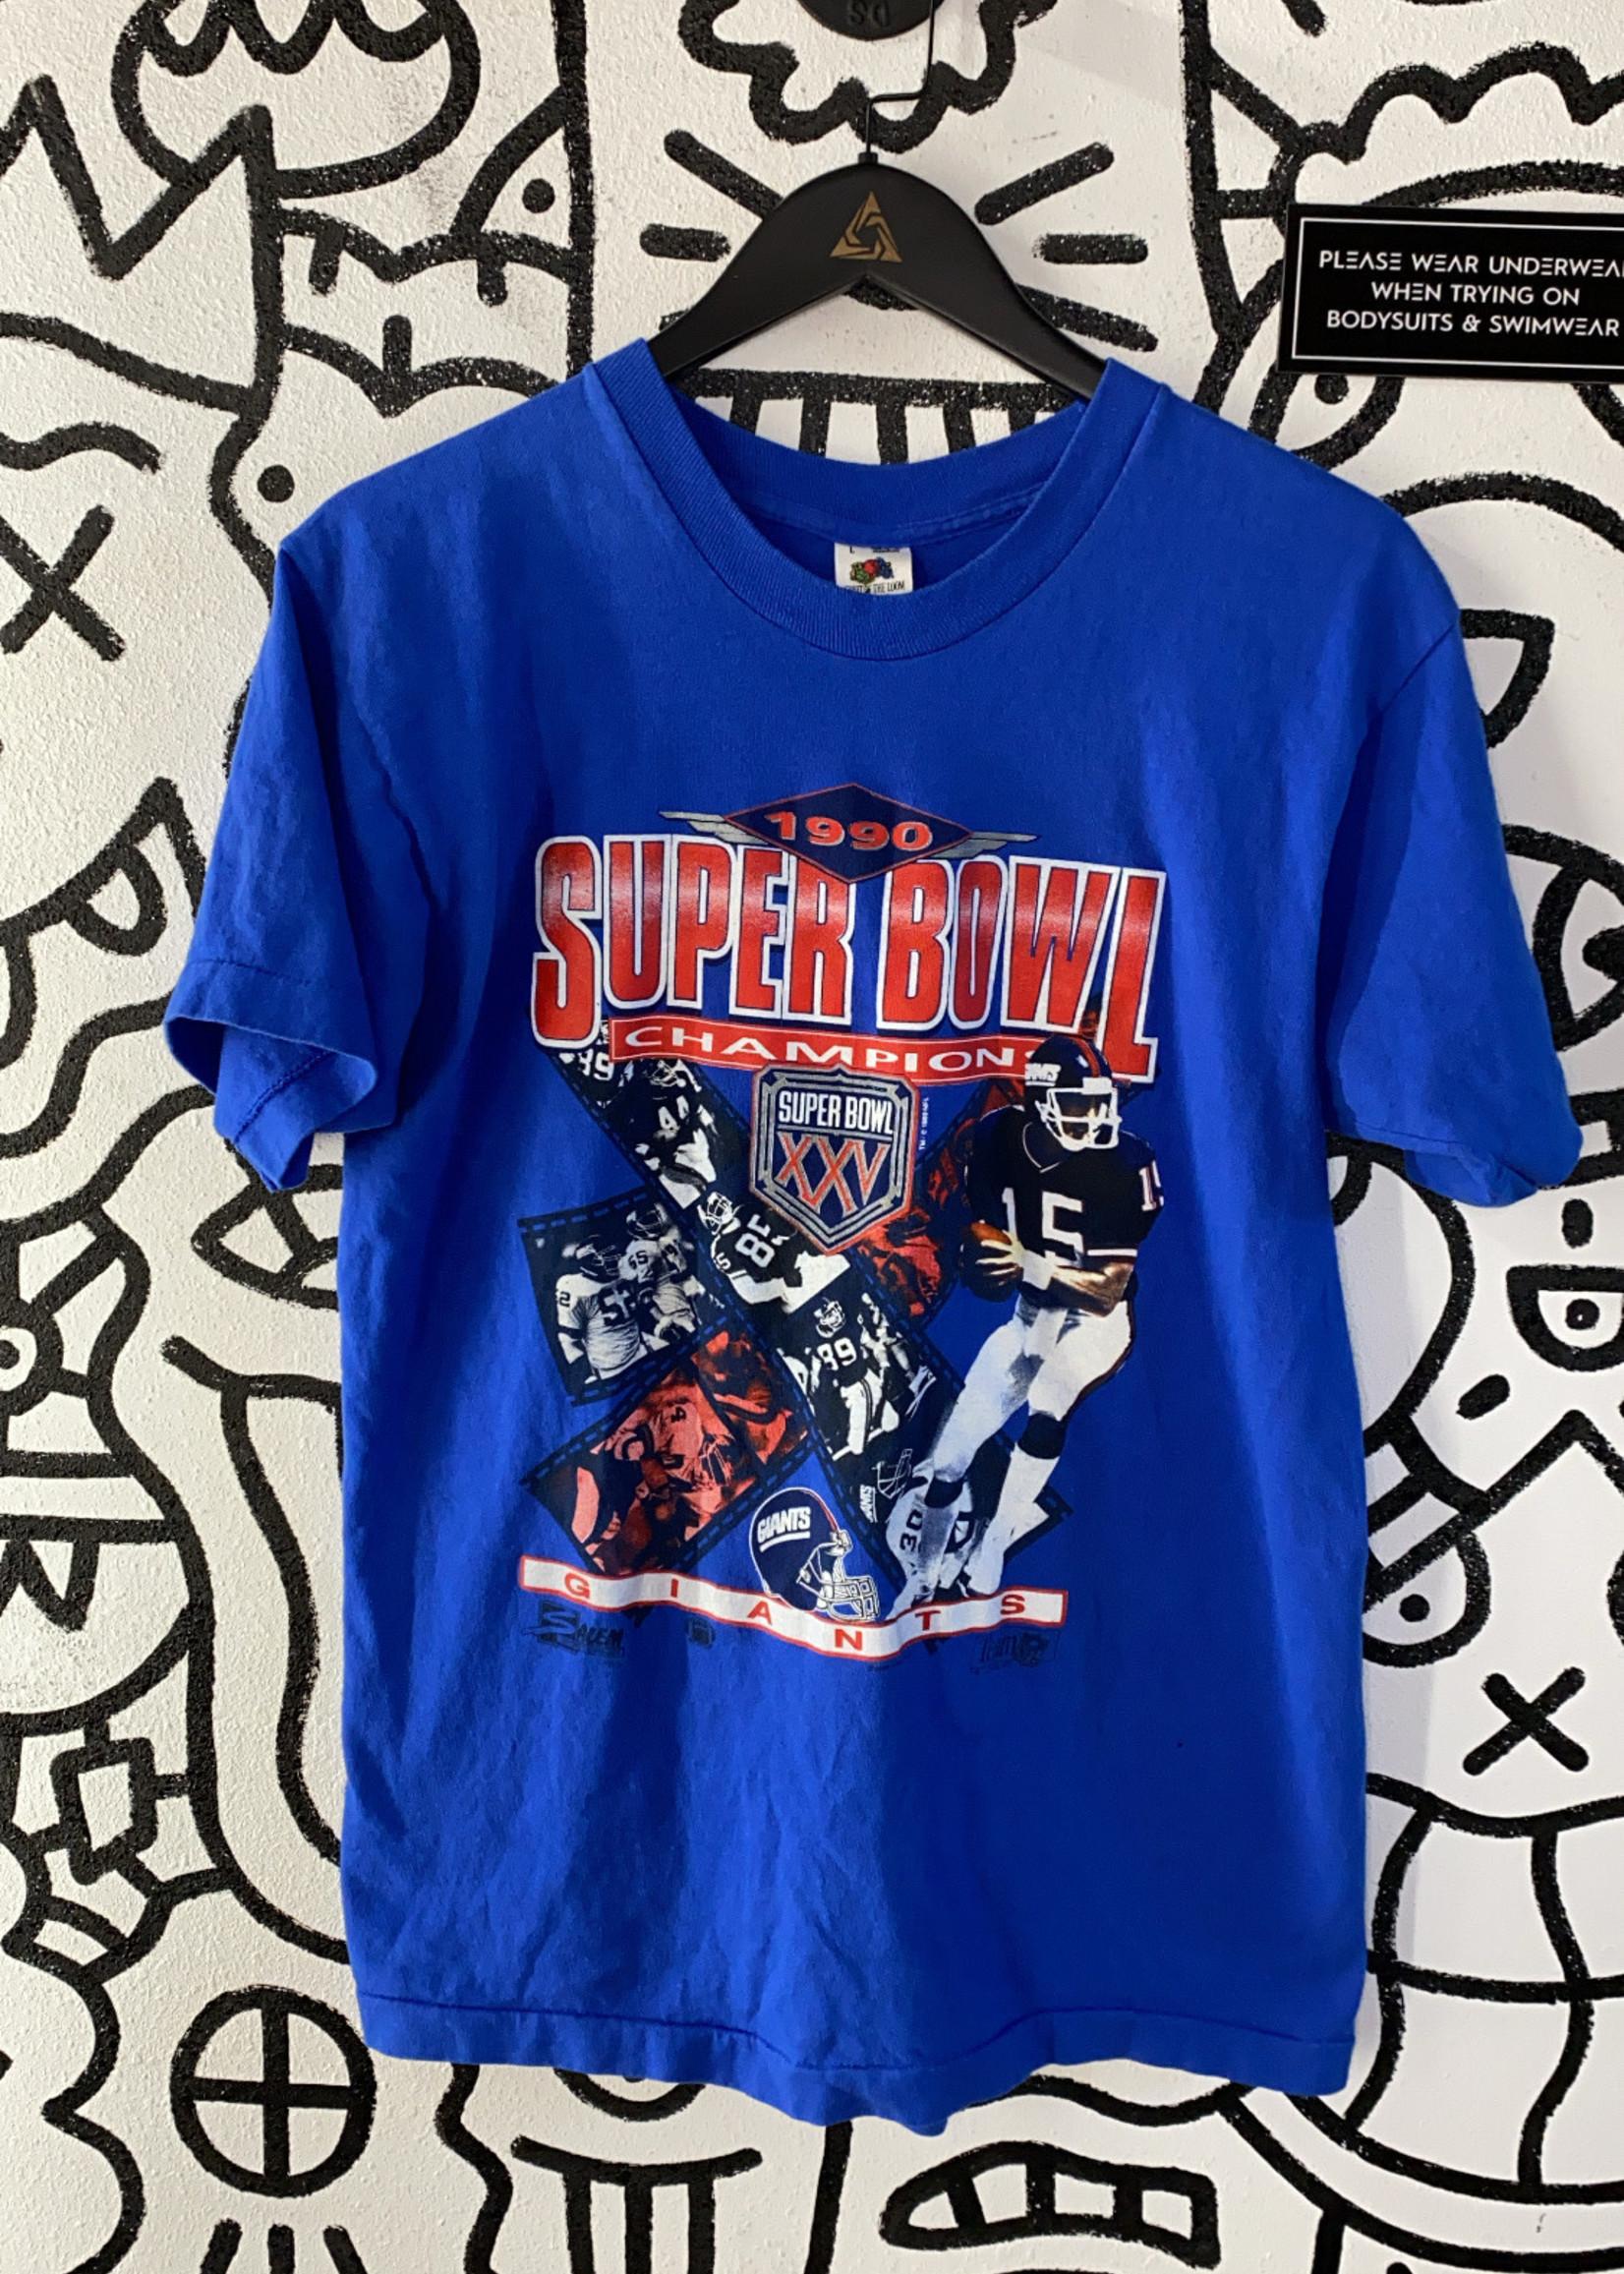 1990 Super Bowl Champions Blue Giants Tee L